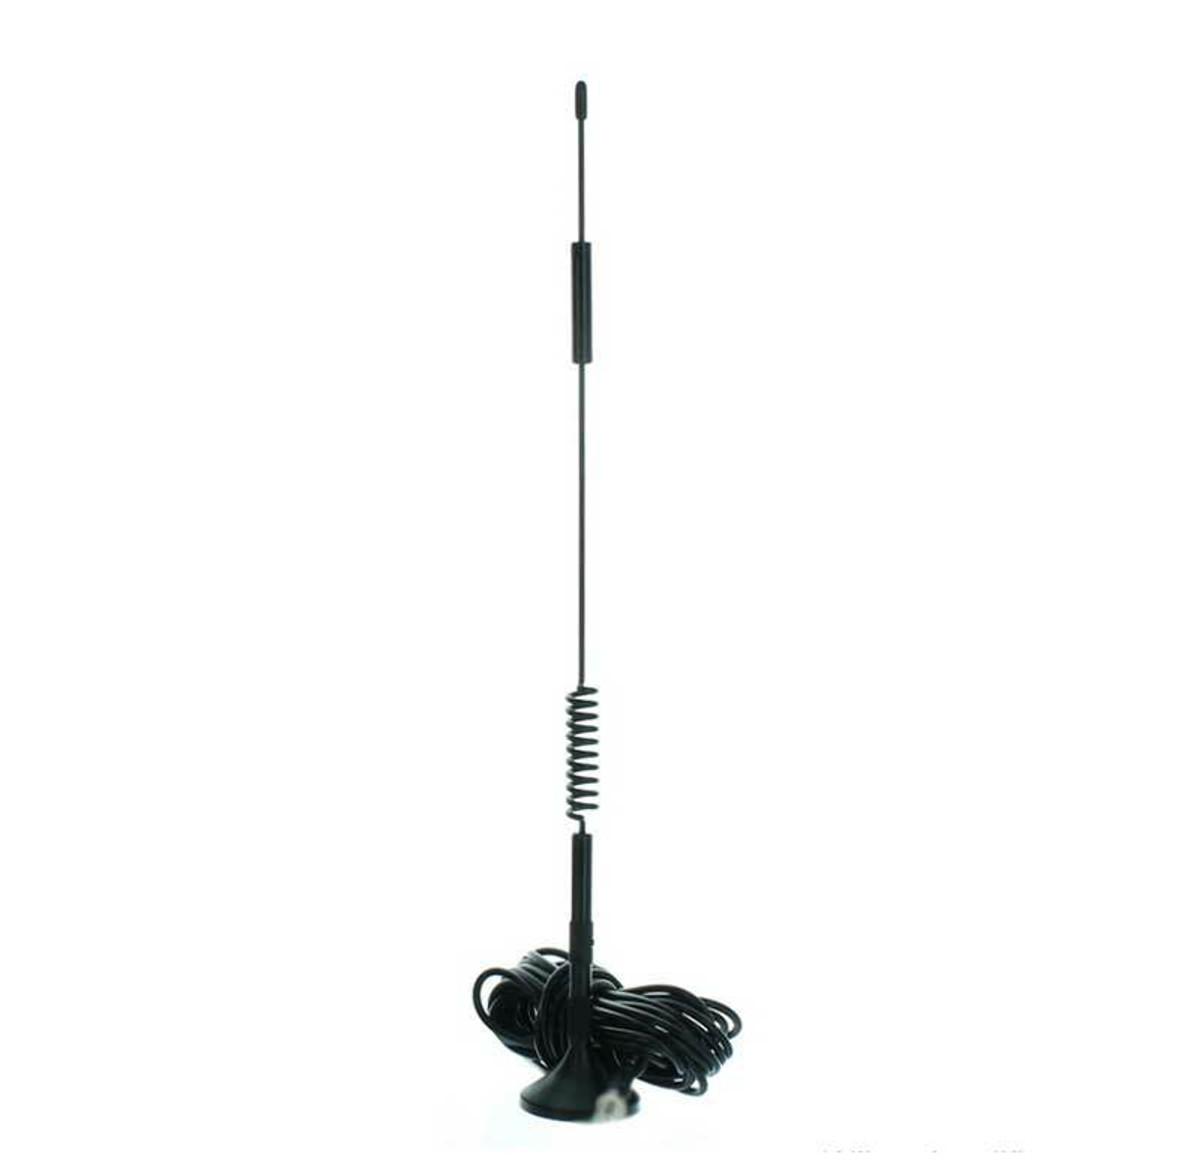 Wilson Electronics weBoost Wilson 311128 12 Magnet-Mount Antenna or 10ft TNC